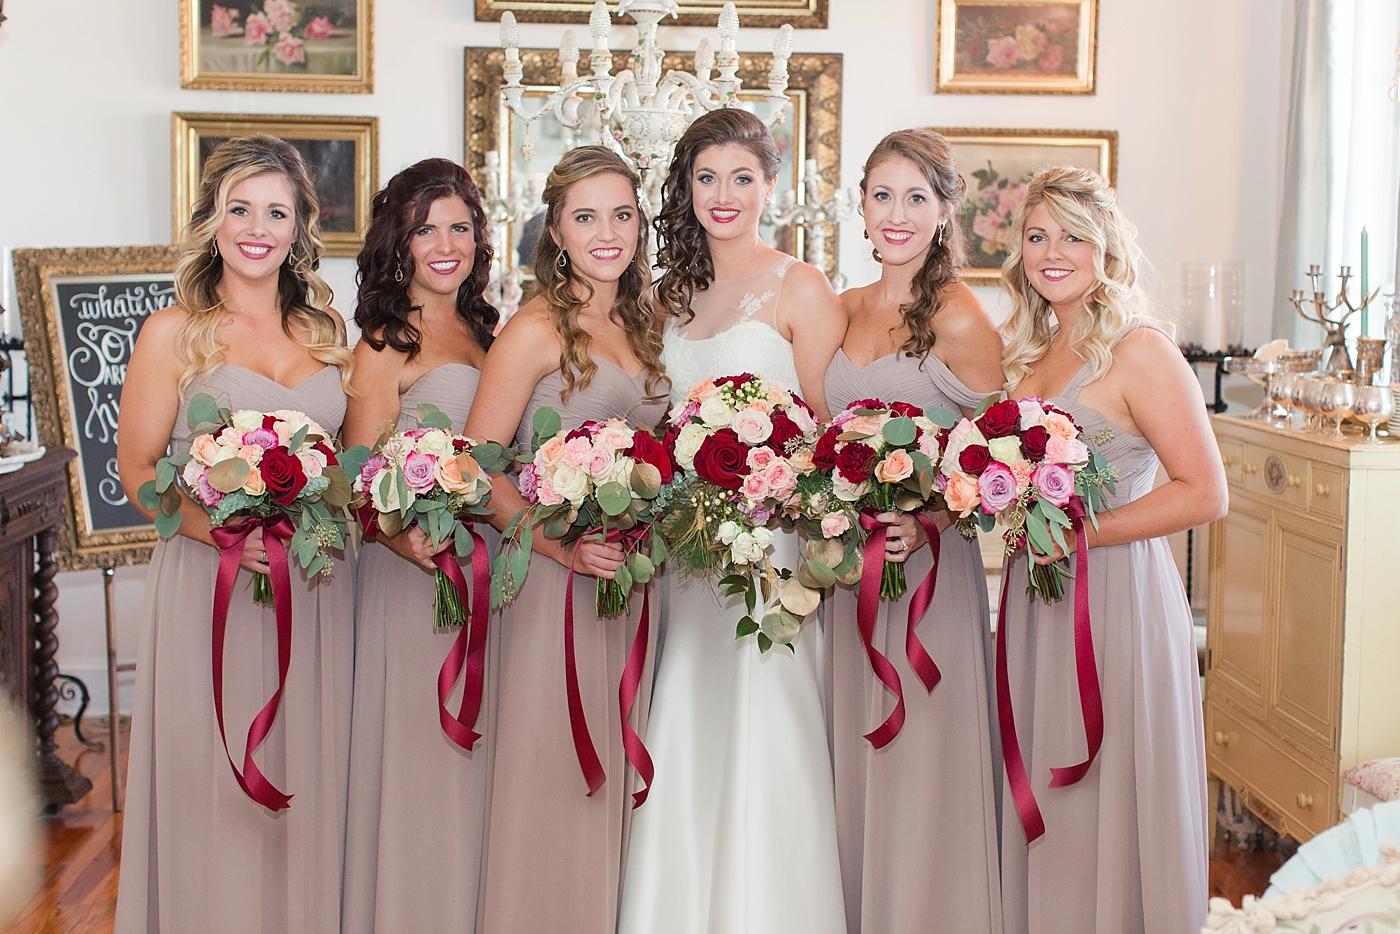 greenville-nc-wedding-the-robins-nest_25.jpg